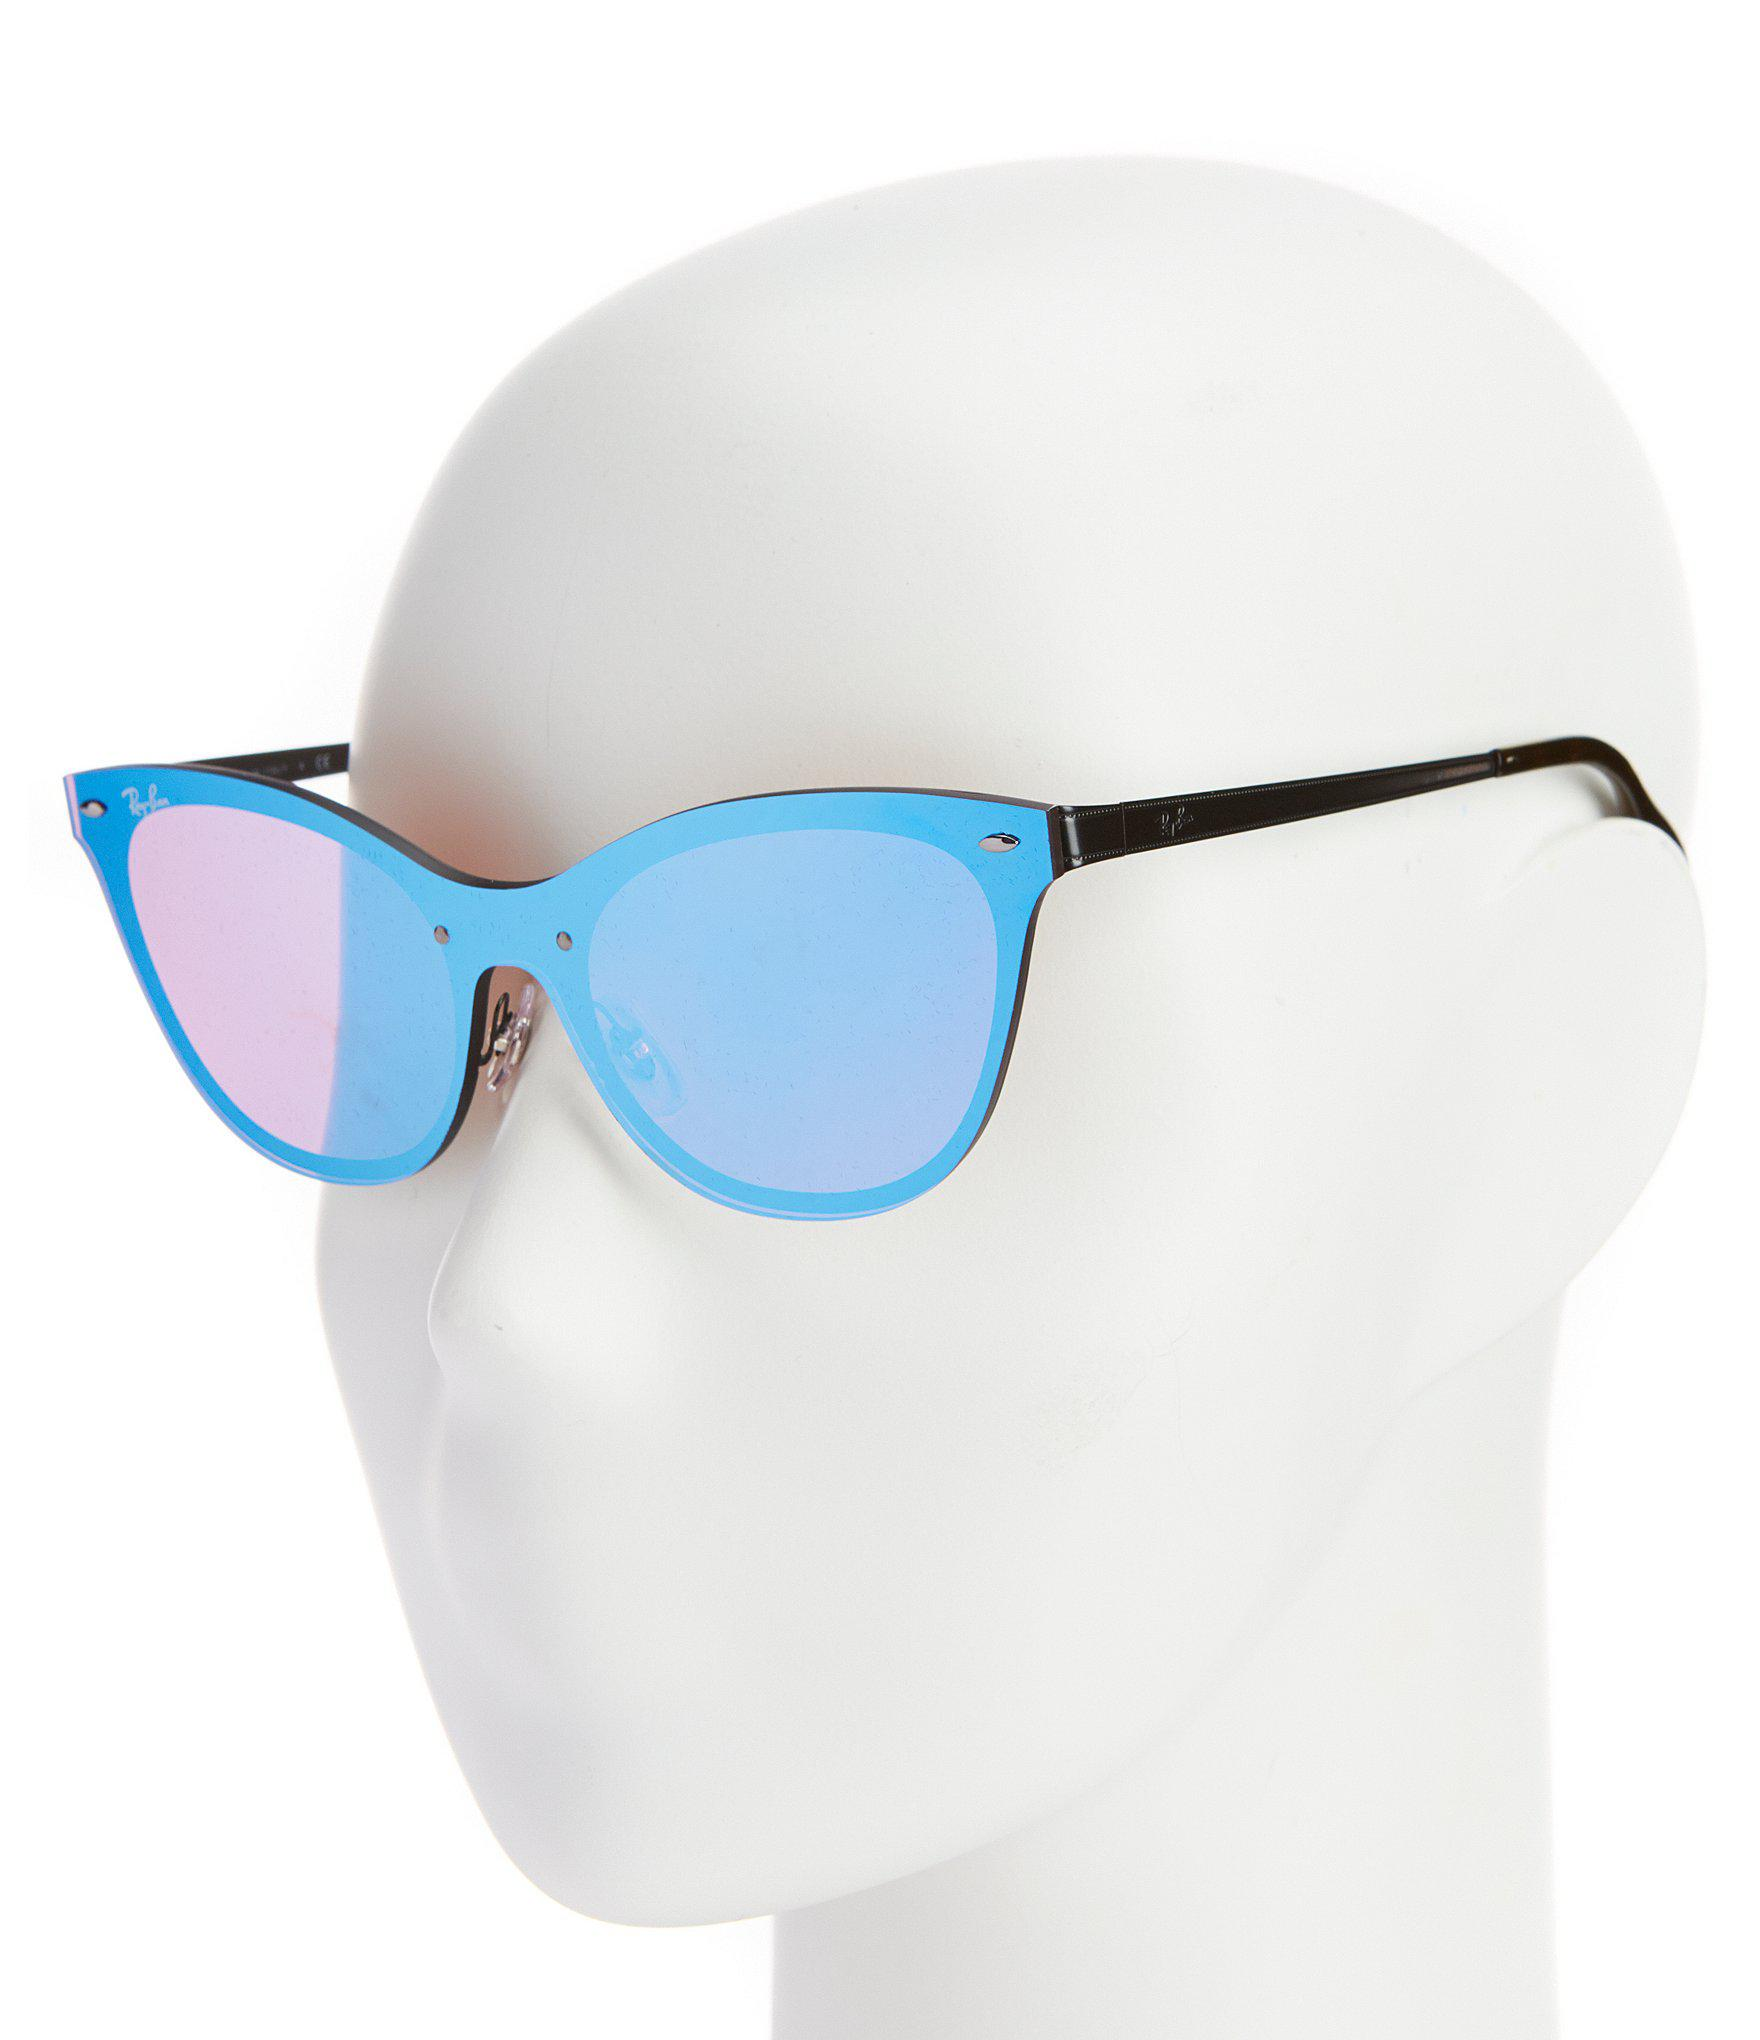 Ray-Ban - Blue Blaze Collection Cateye Rimless Mirrored Lens Sunglasses -  Lyst. View fullscreen 5ed7f383c26